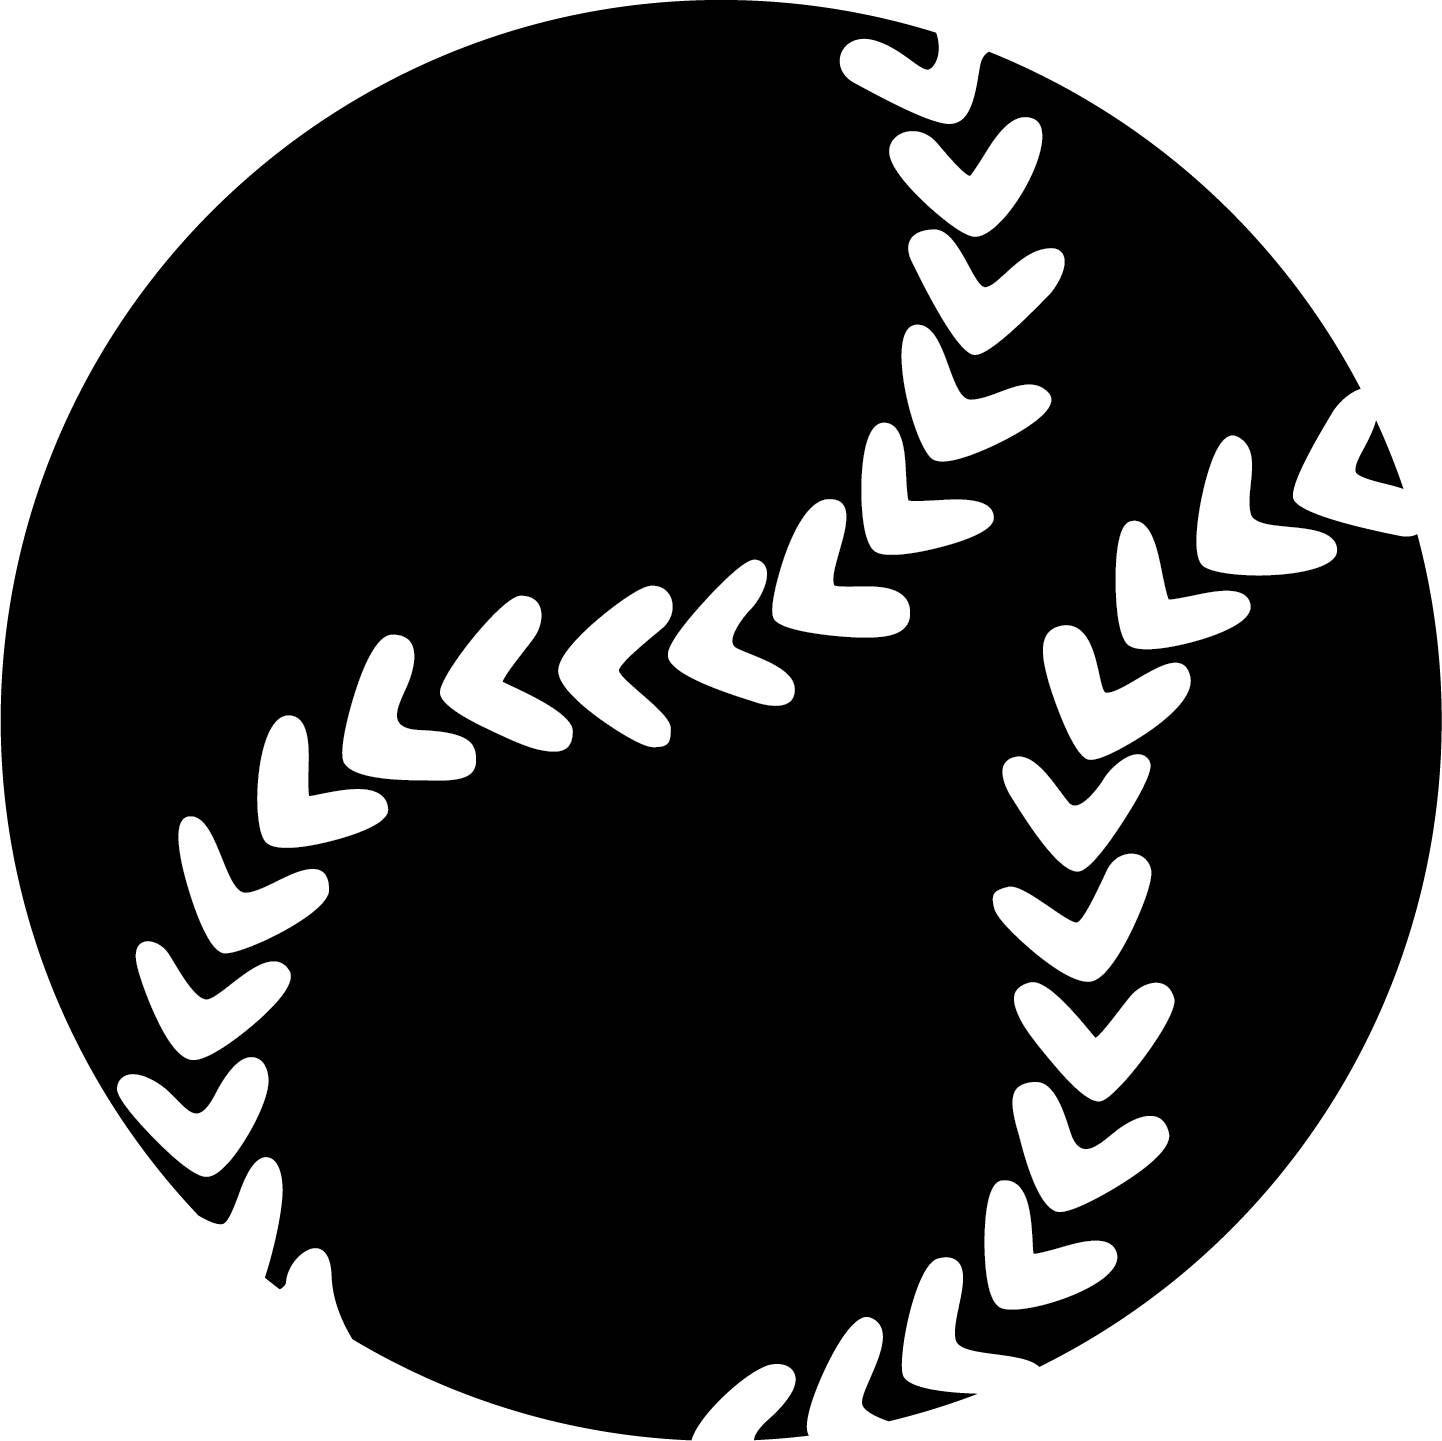 medium resolution of softball ai eps jpg png and svg clipart vinyl stencil cricut silhouette cameo by riasdigitaldesigns on etsy